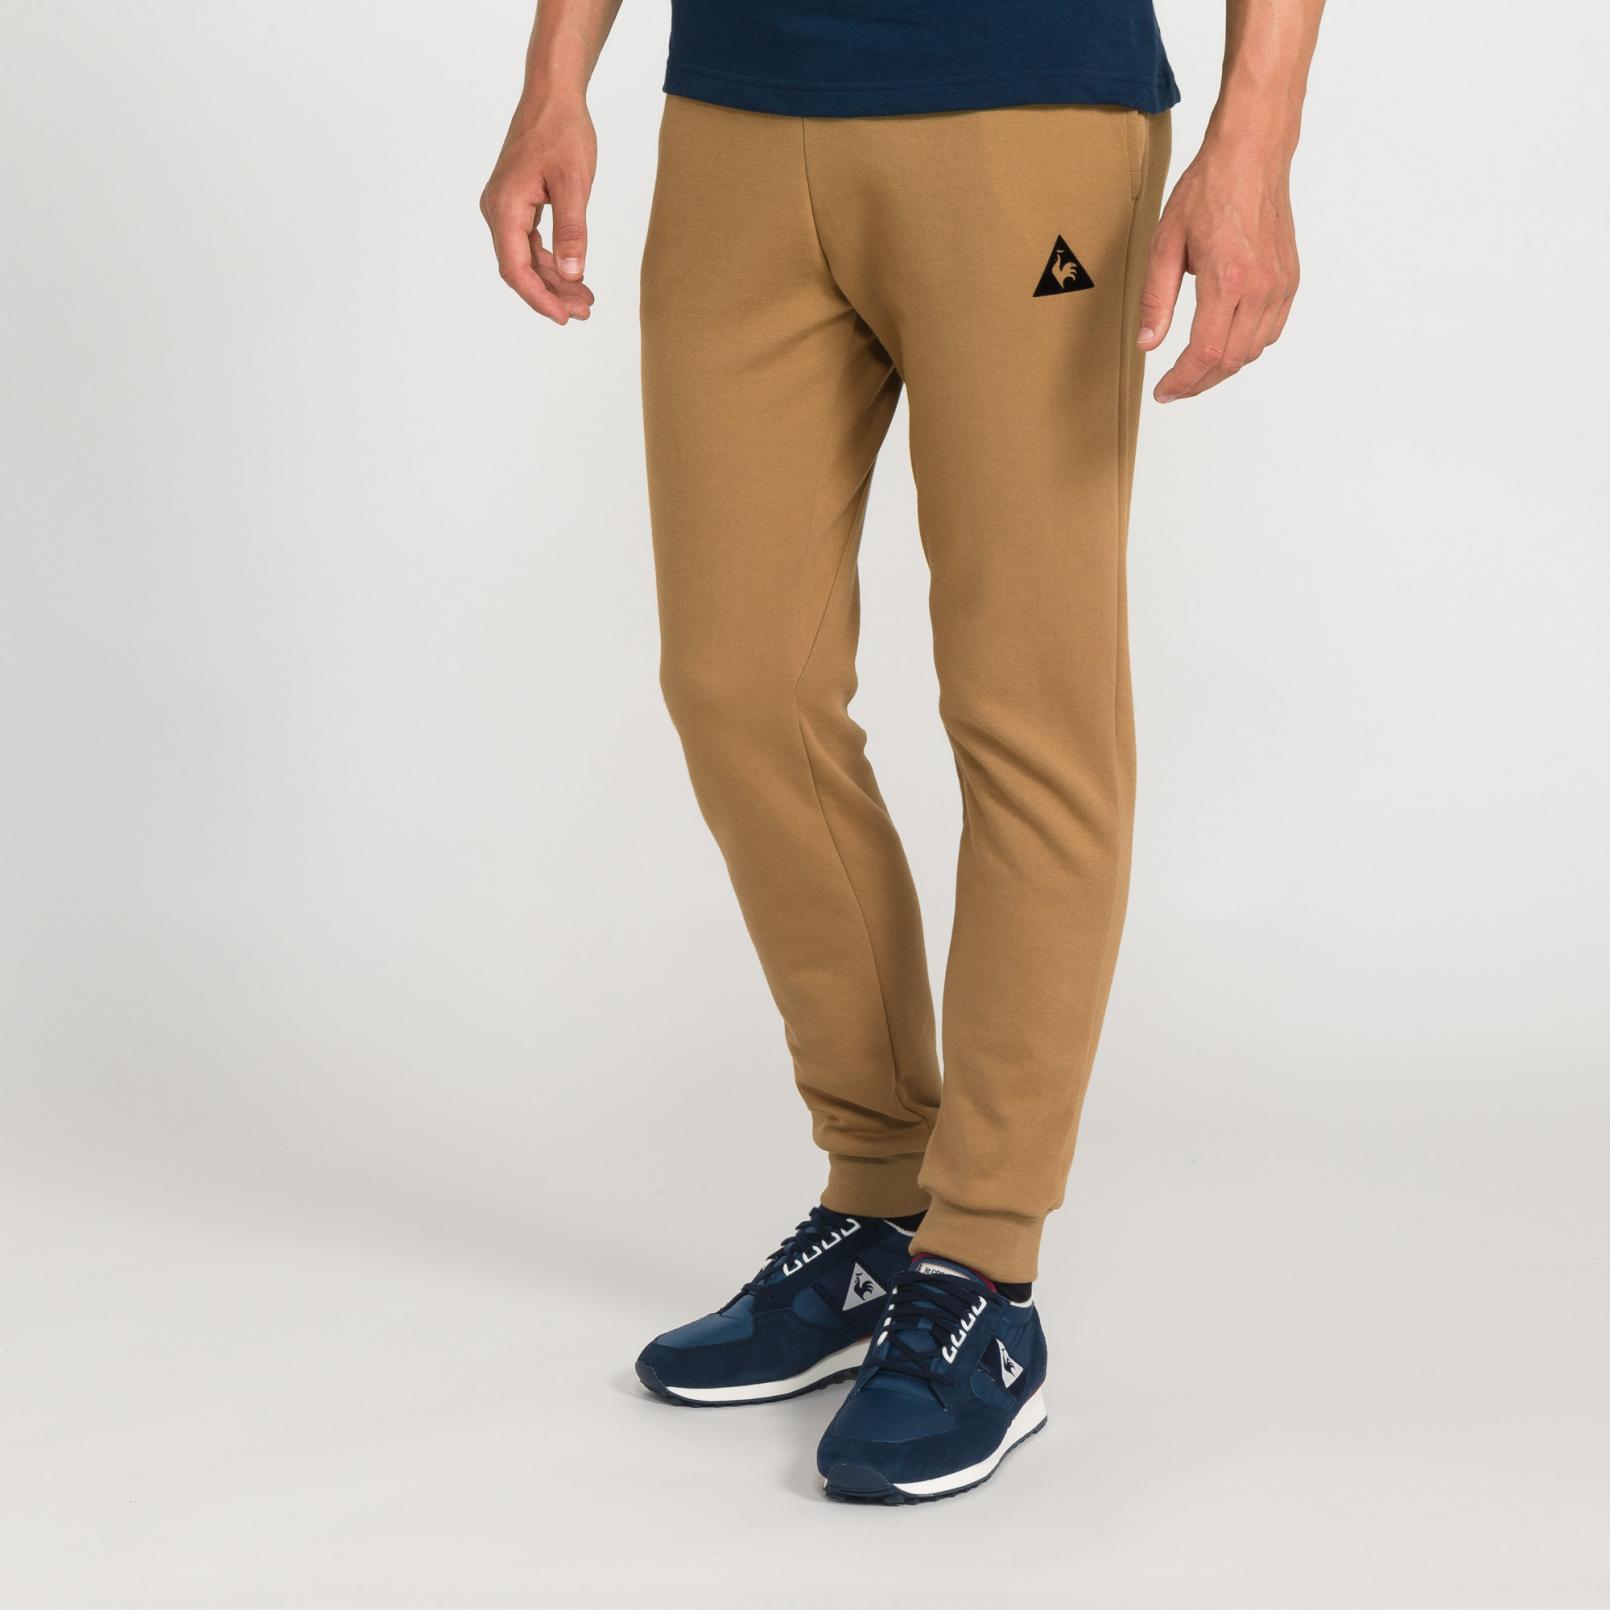 Pants – Le Coq Sportif Essentiels Pant Tapered Brown